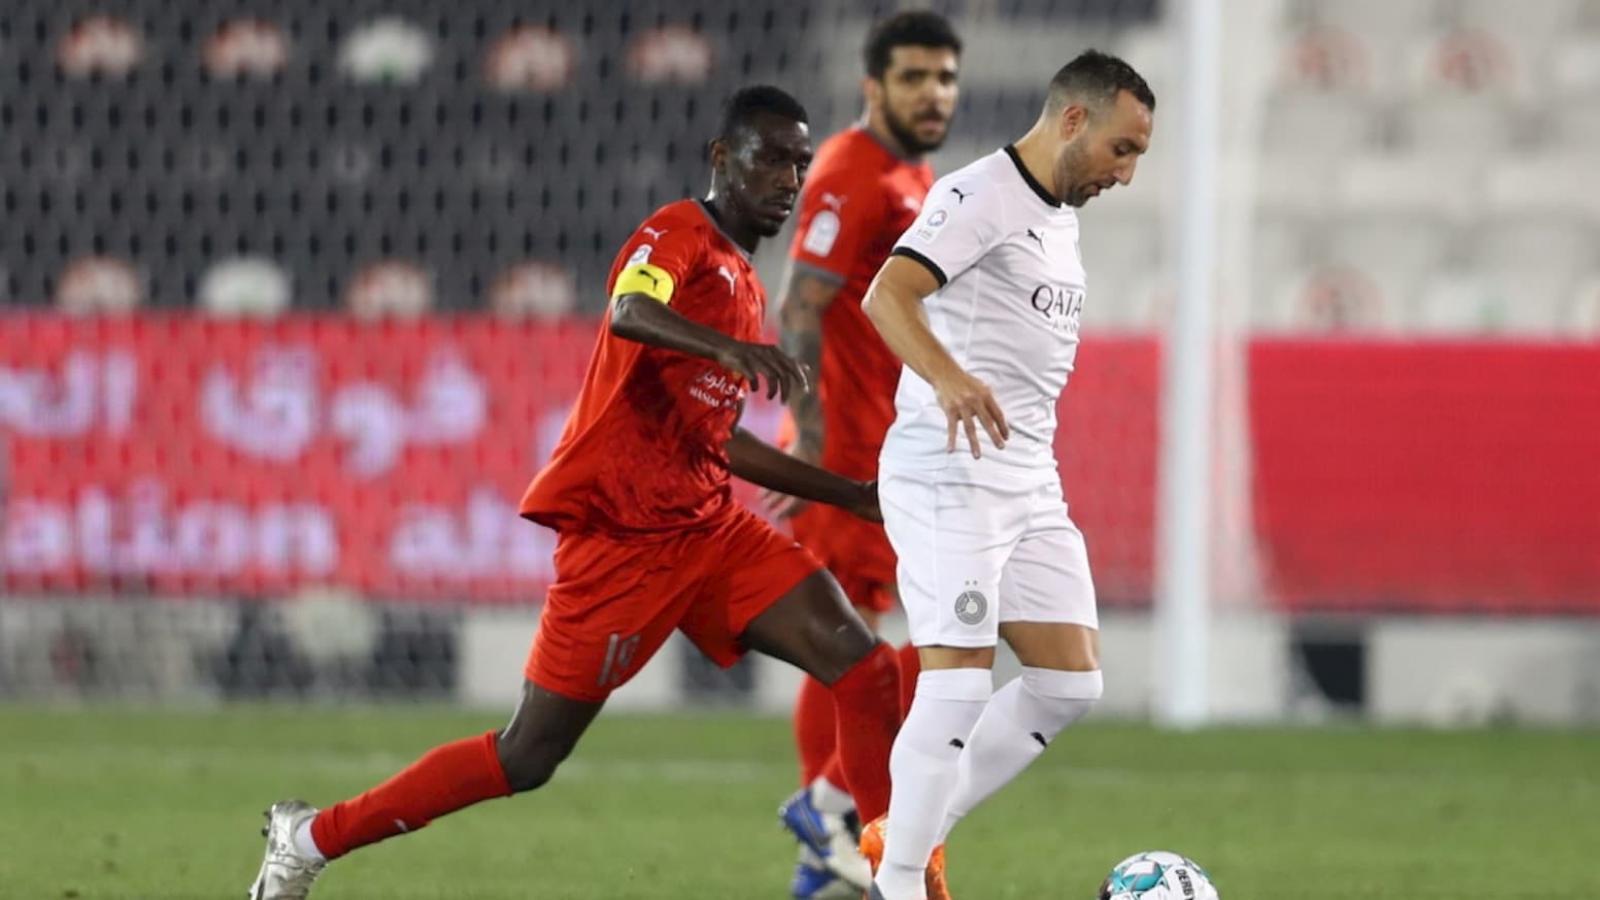 WATCH: QNB Stars League - Week 14 highlights